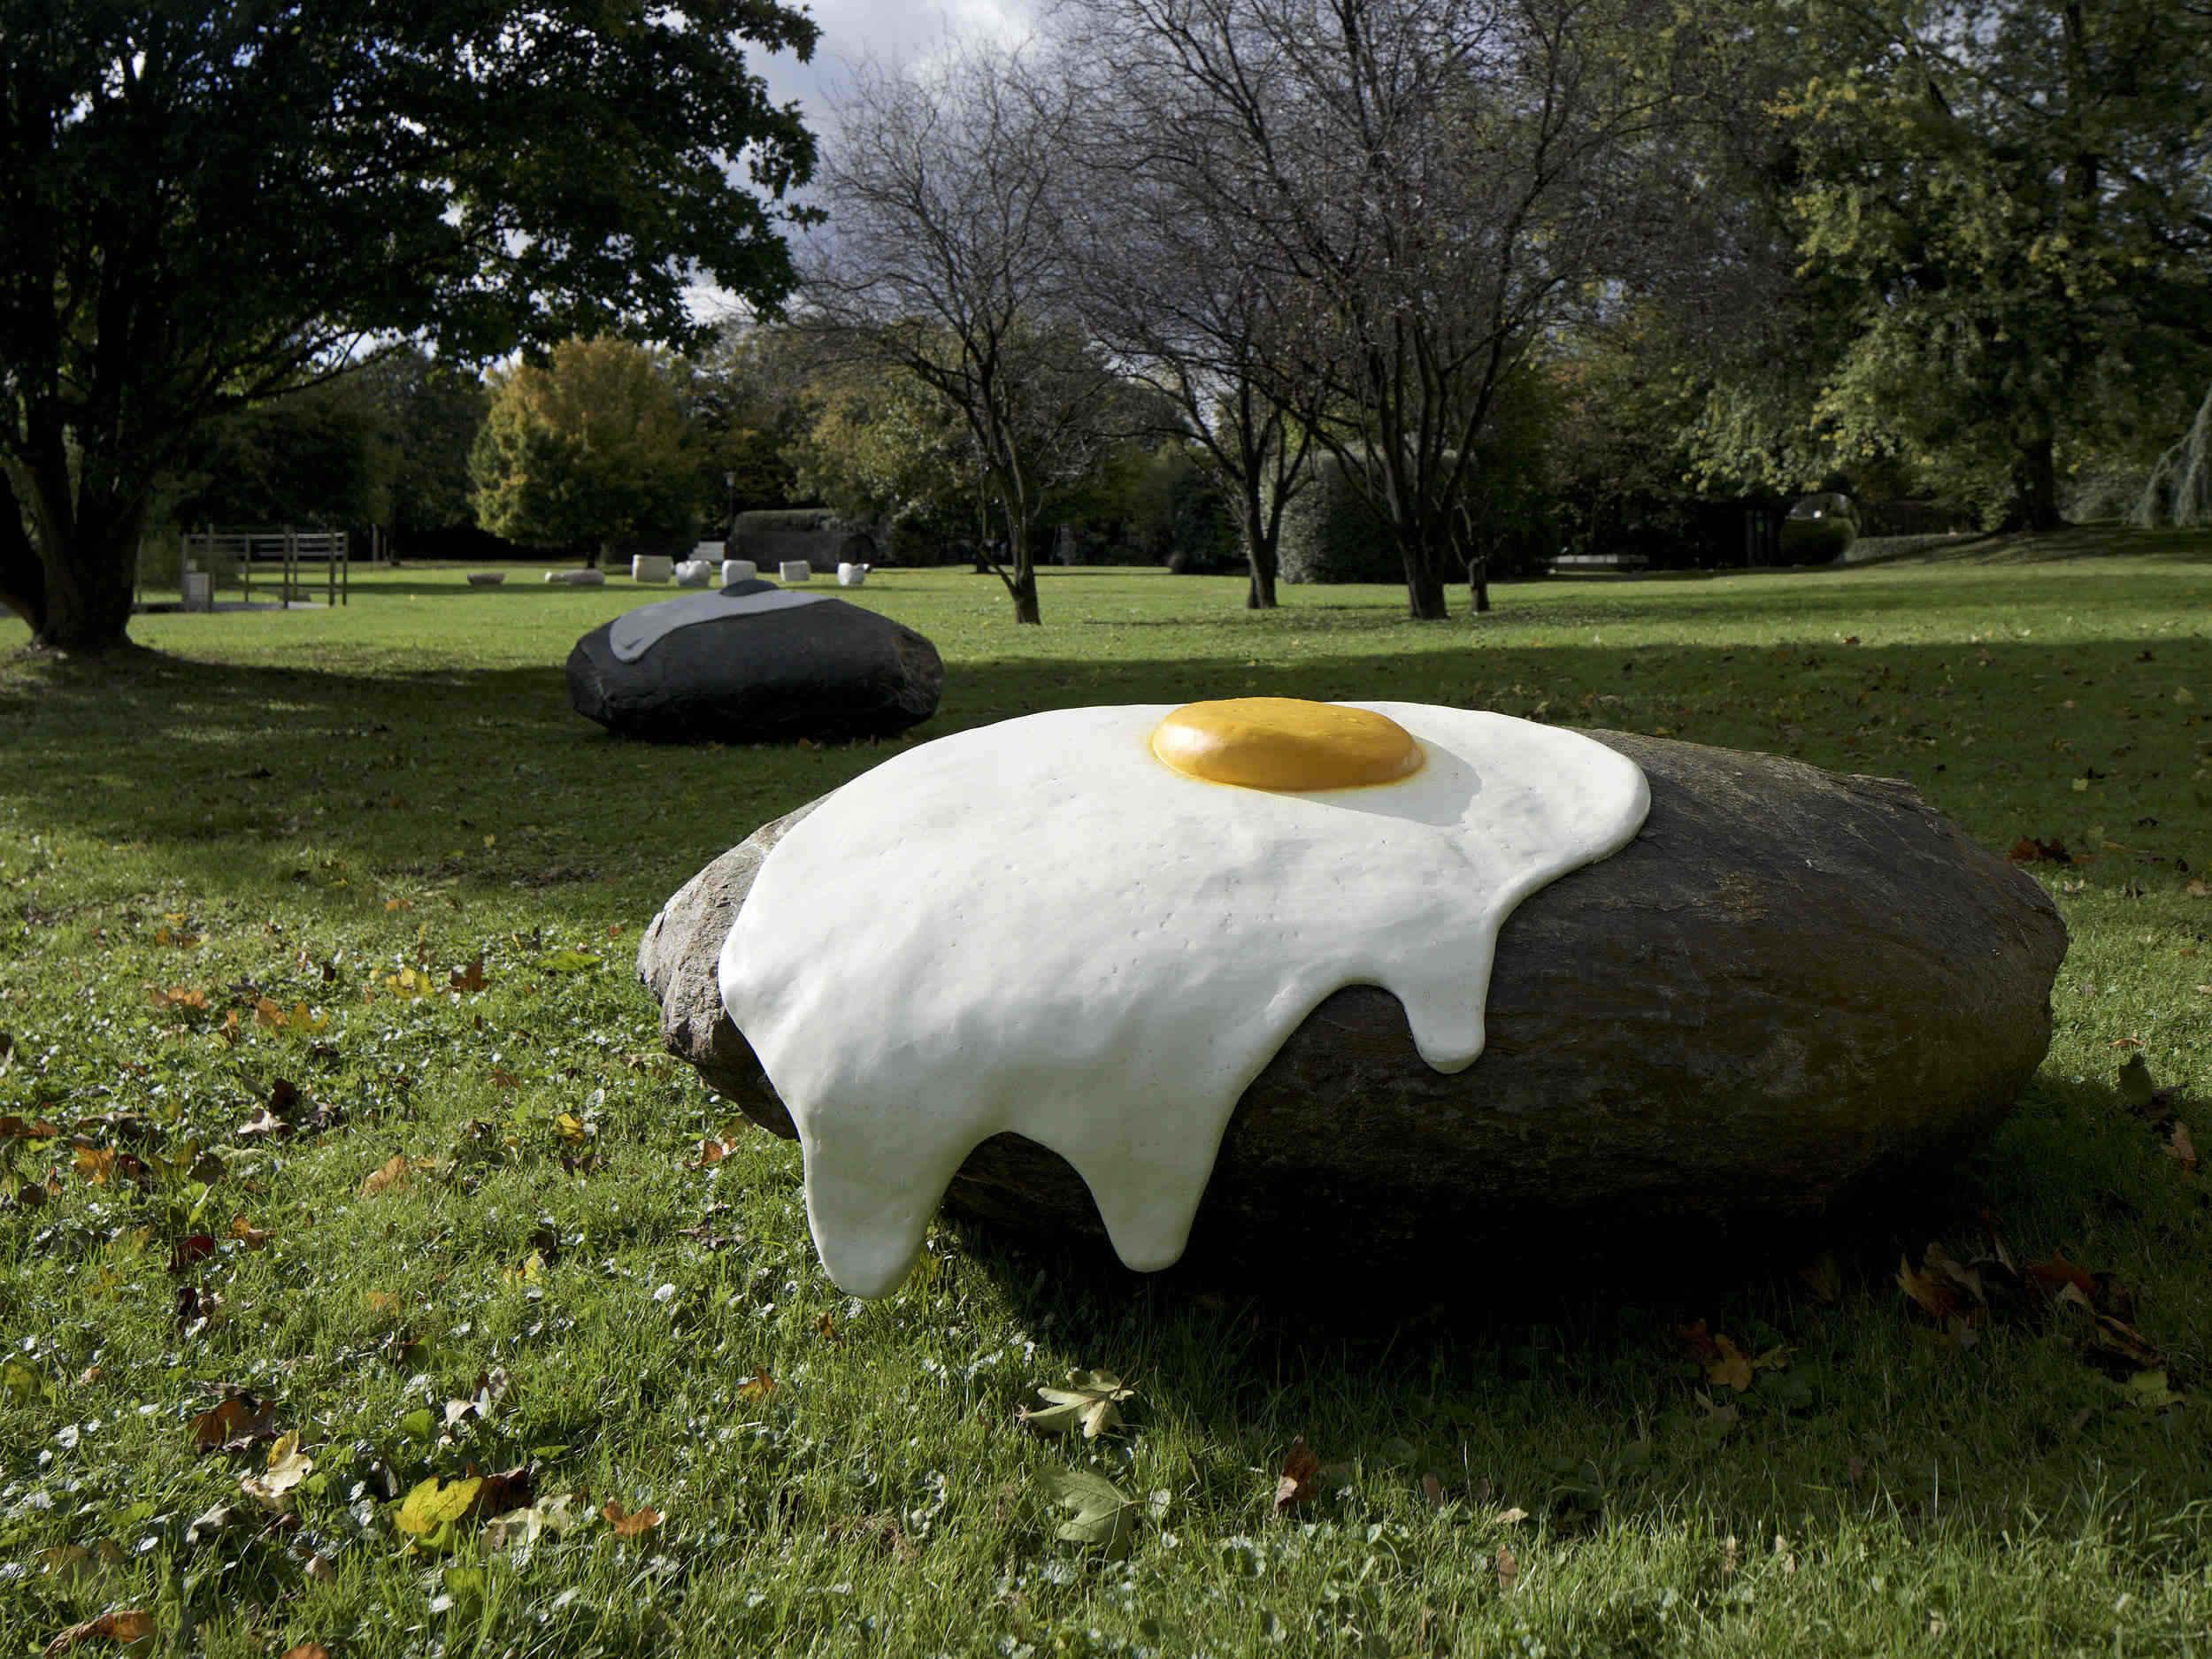 Pedro Wirz, 'Trilobites', 2013-17, Courtesy of the artist (Cologne Sculpture Park)